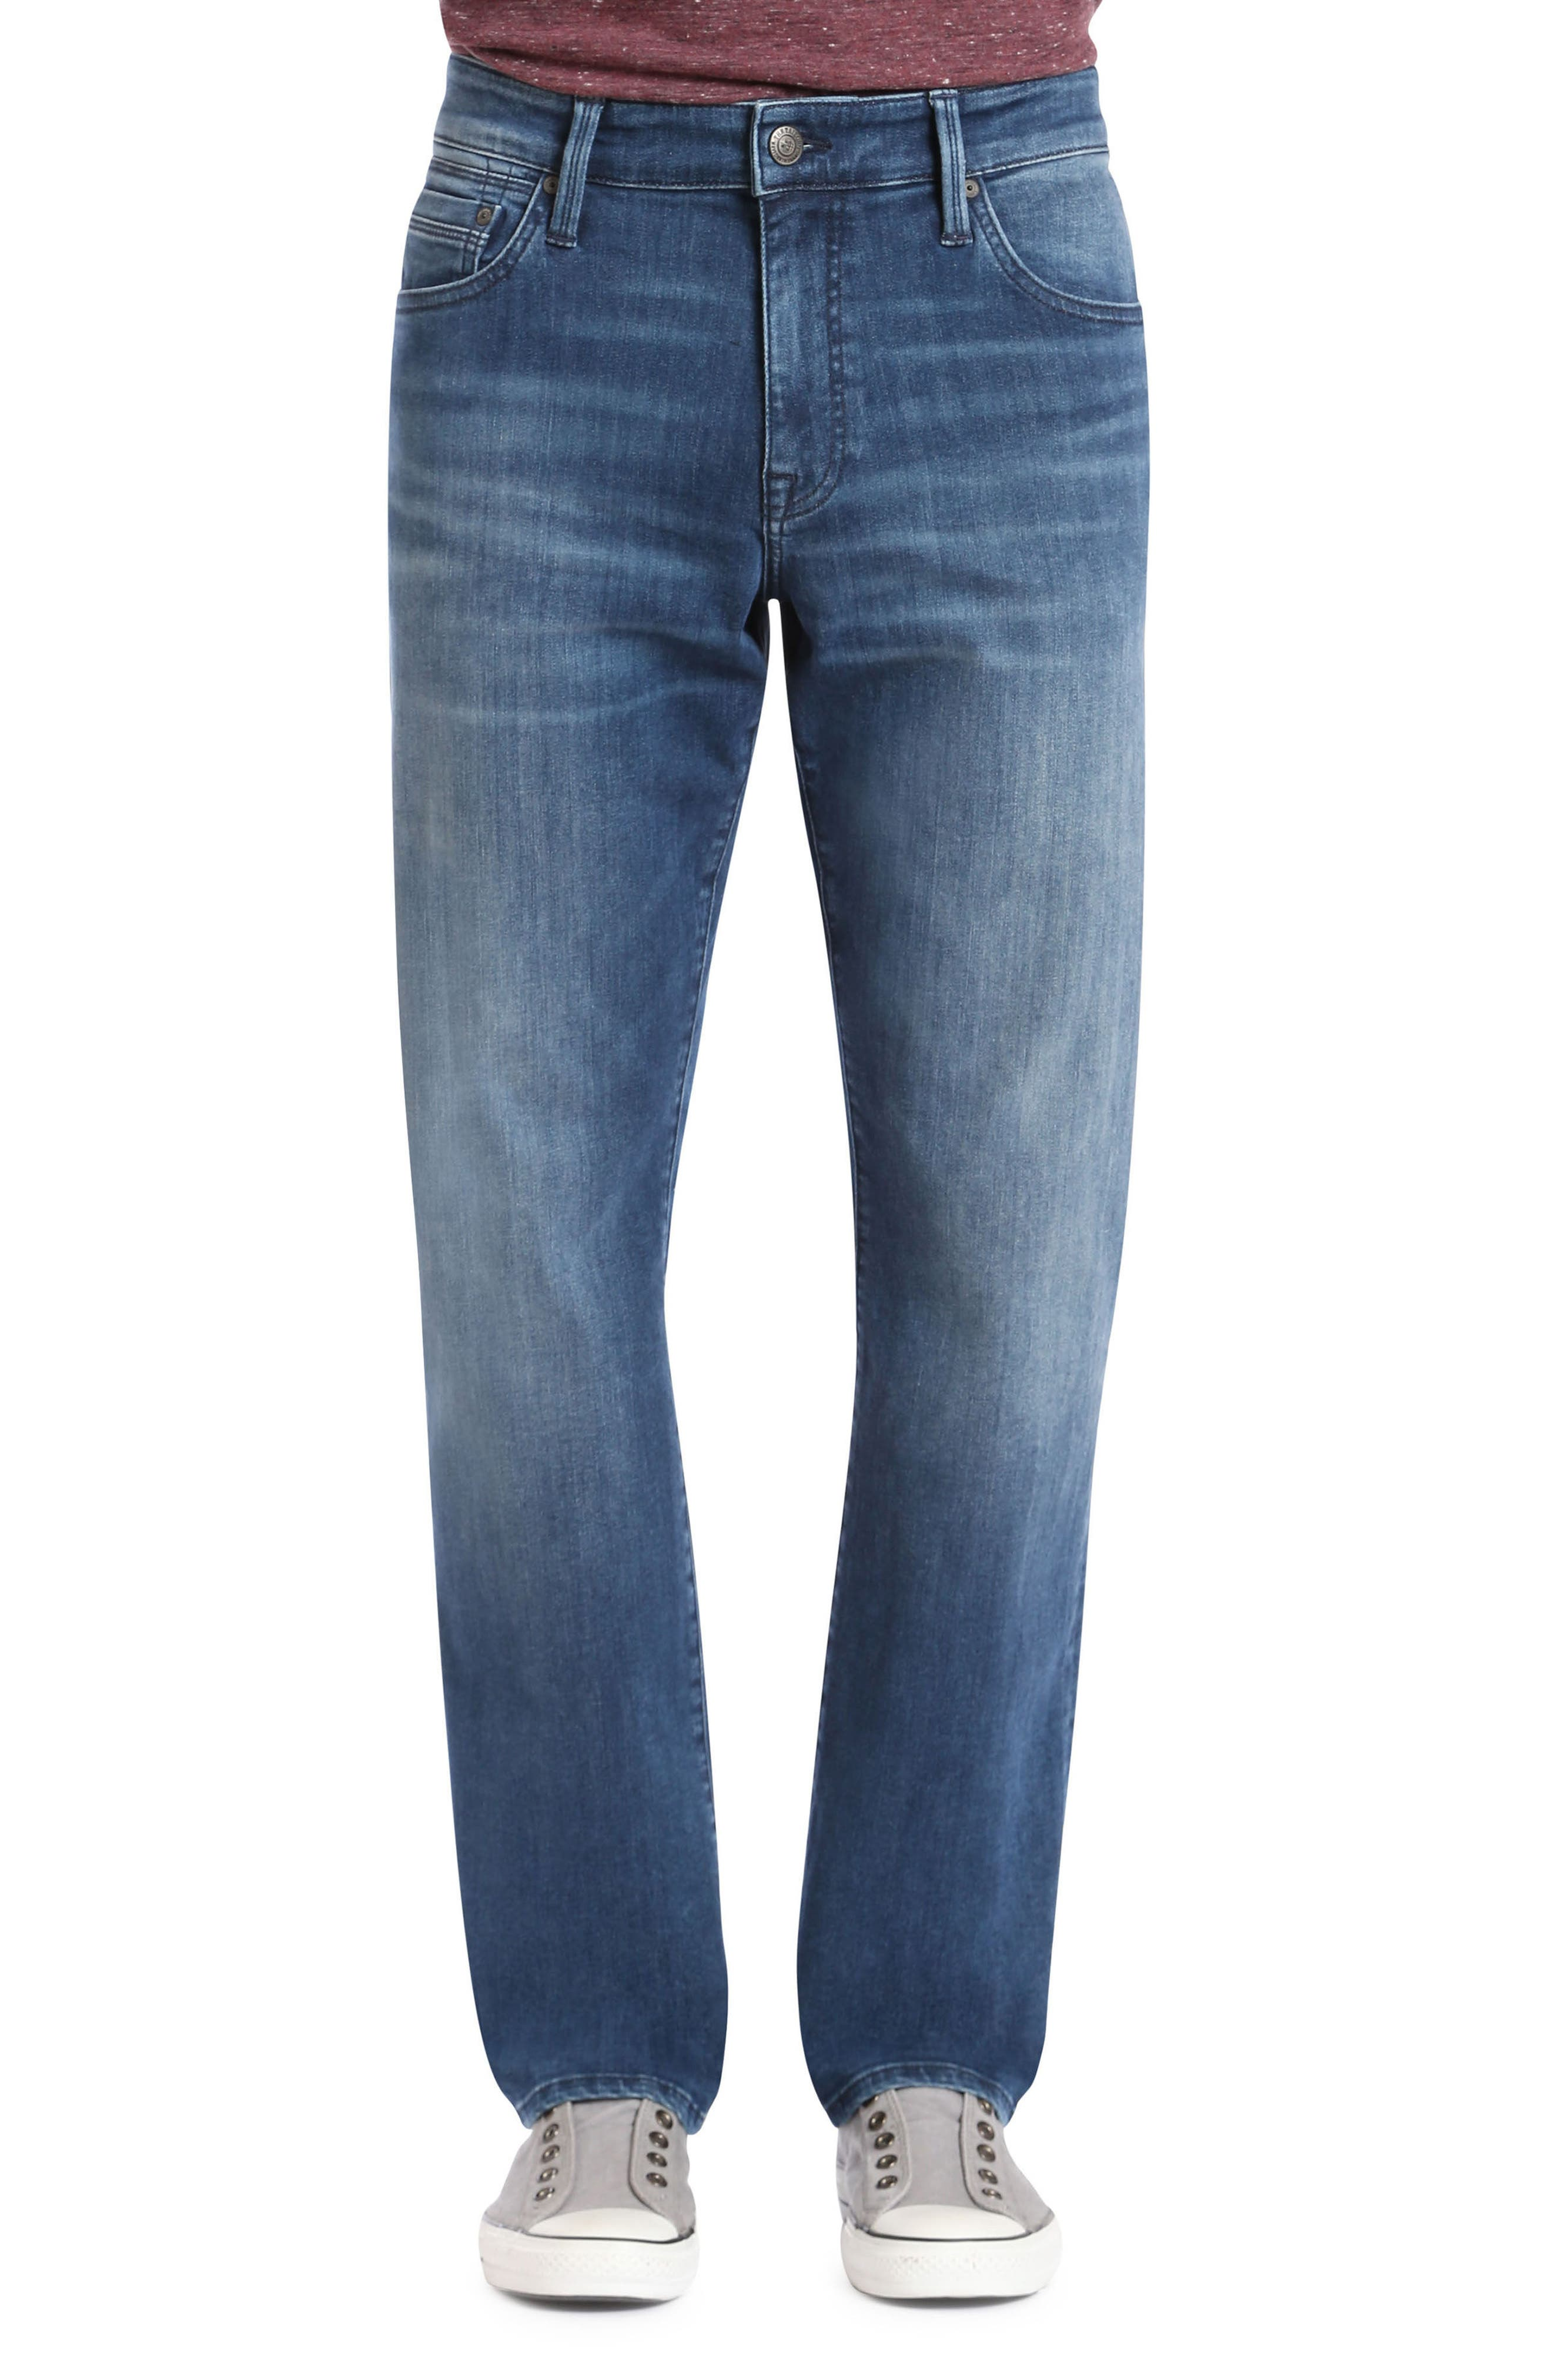 Myles Straight Leg Jeans,                             Main thumbnail 1, color,                             400